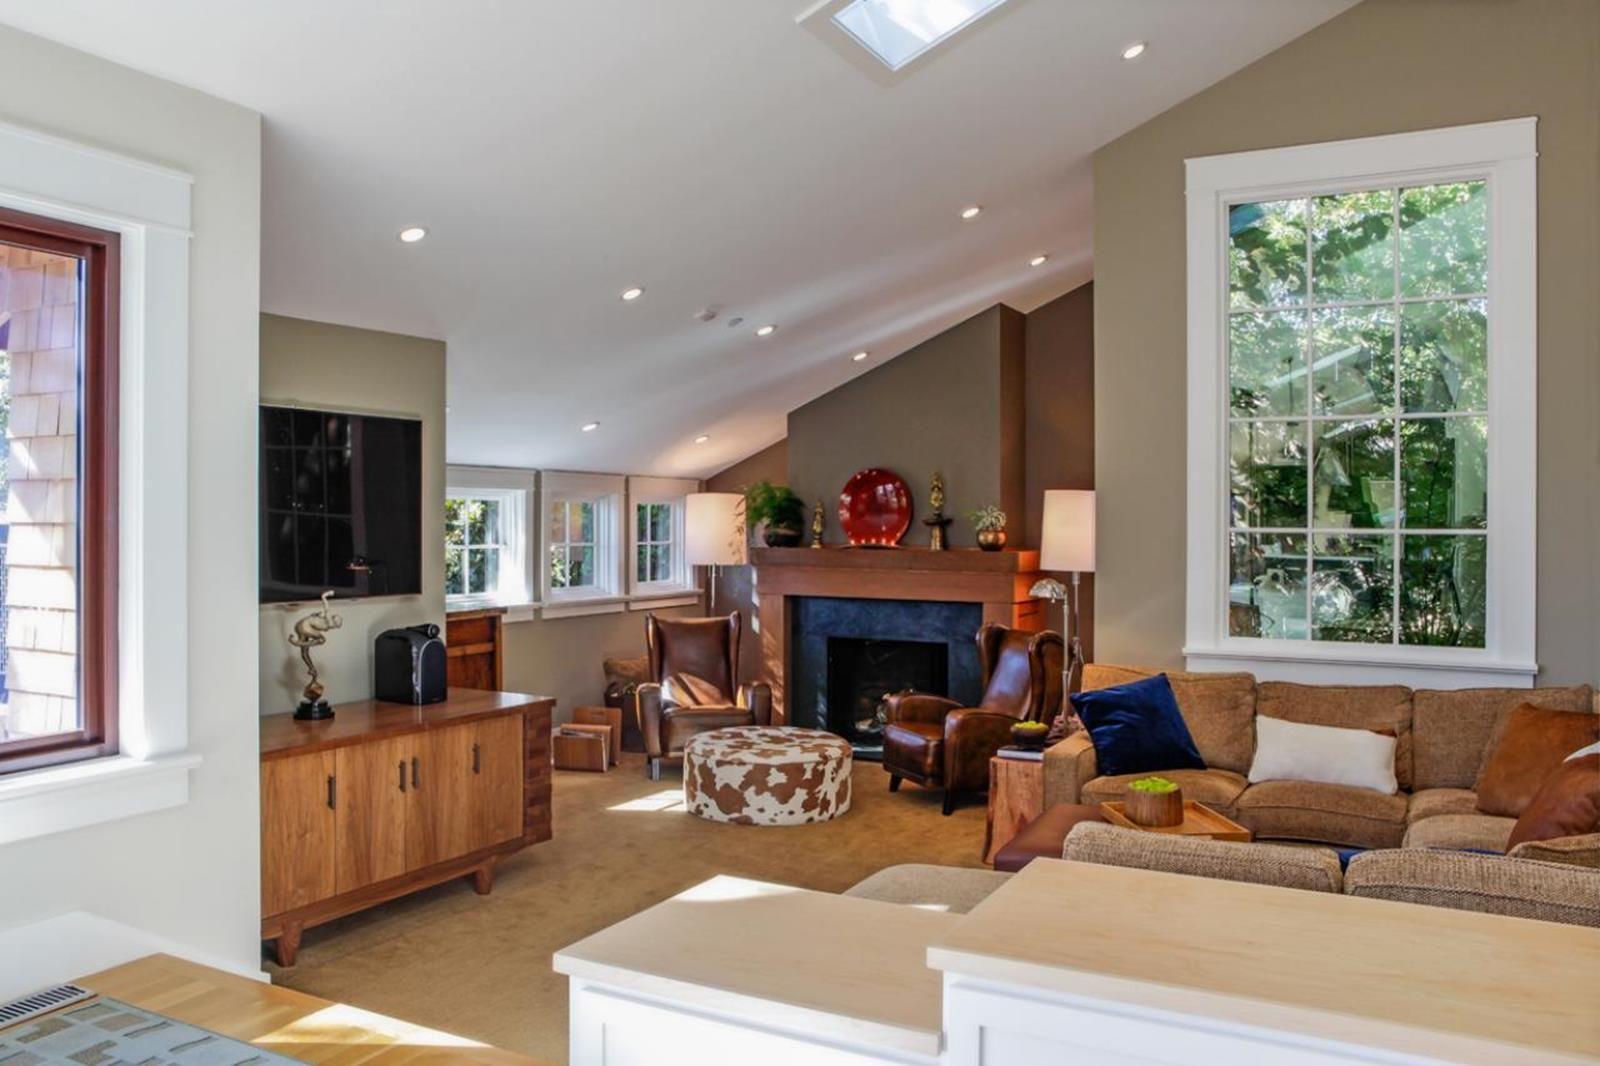 45 Stunning Slanted Ceiling Living Room Ideas Decore